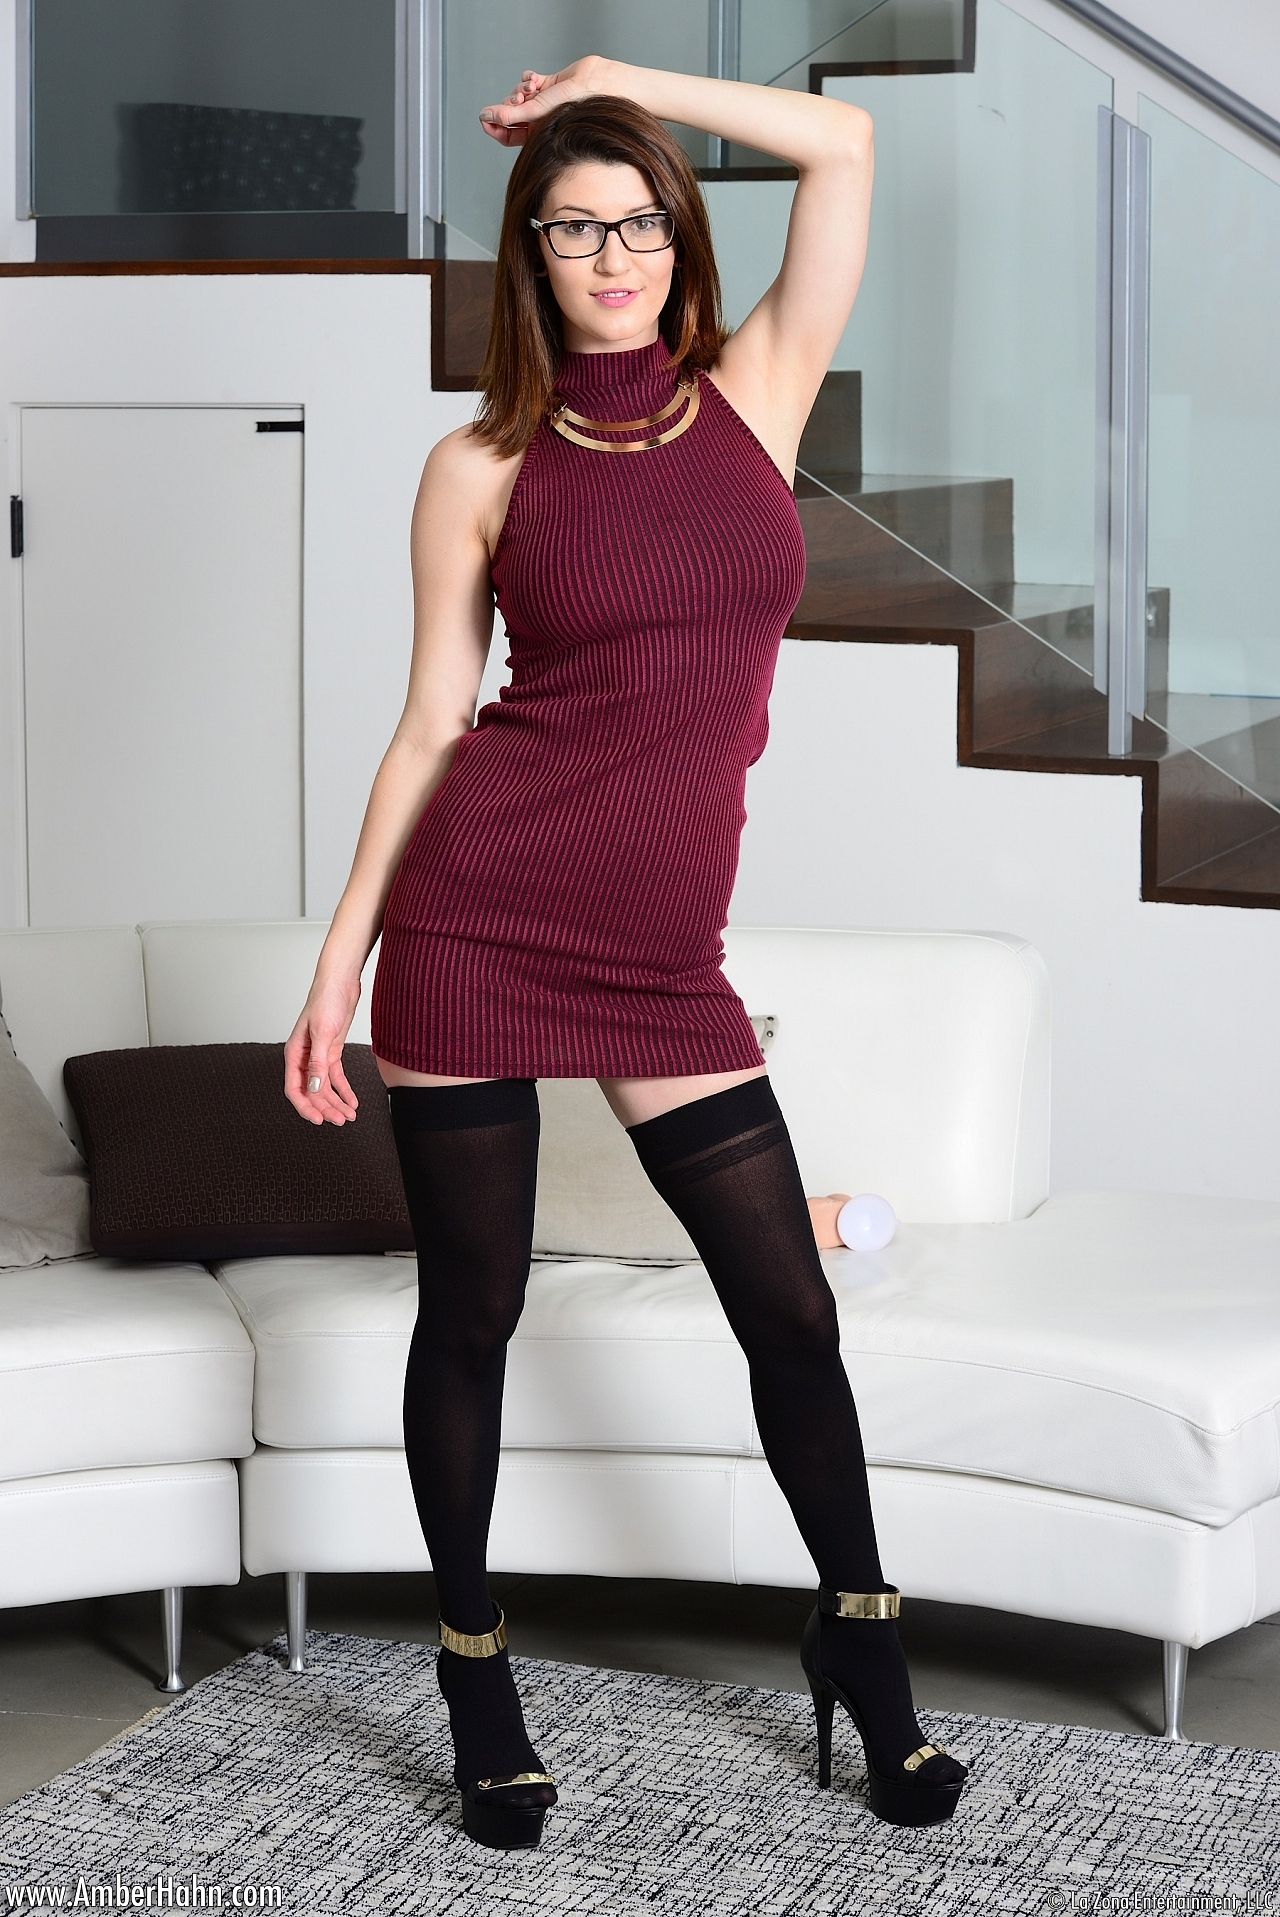 Ebony stocking porn